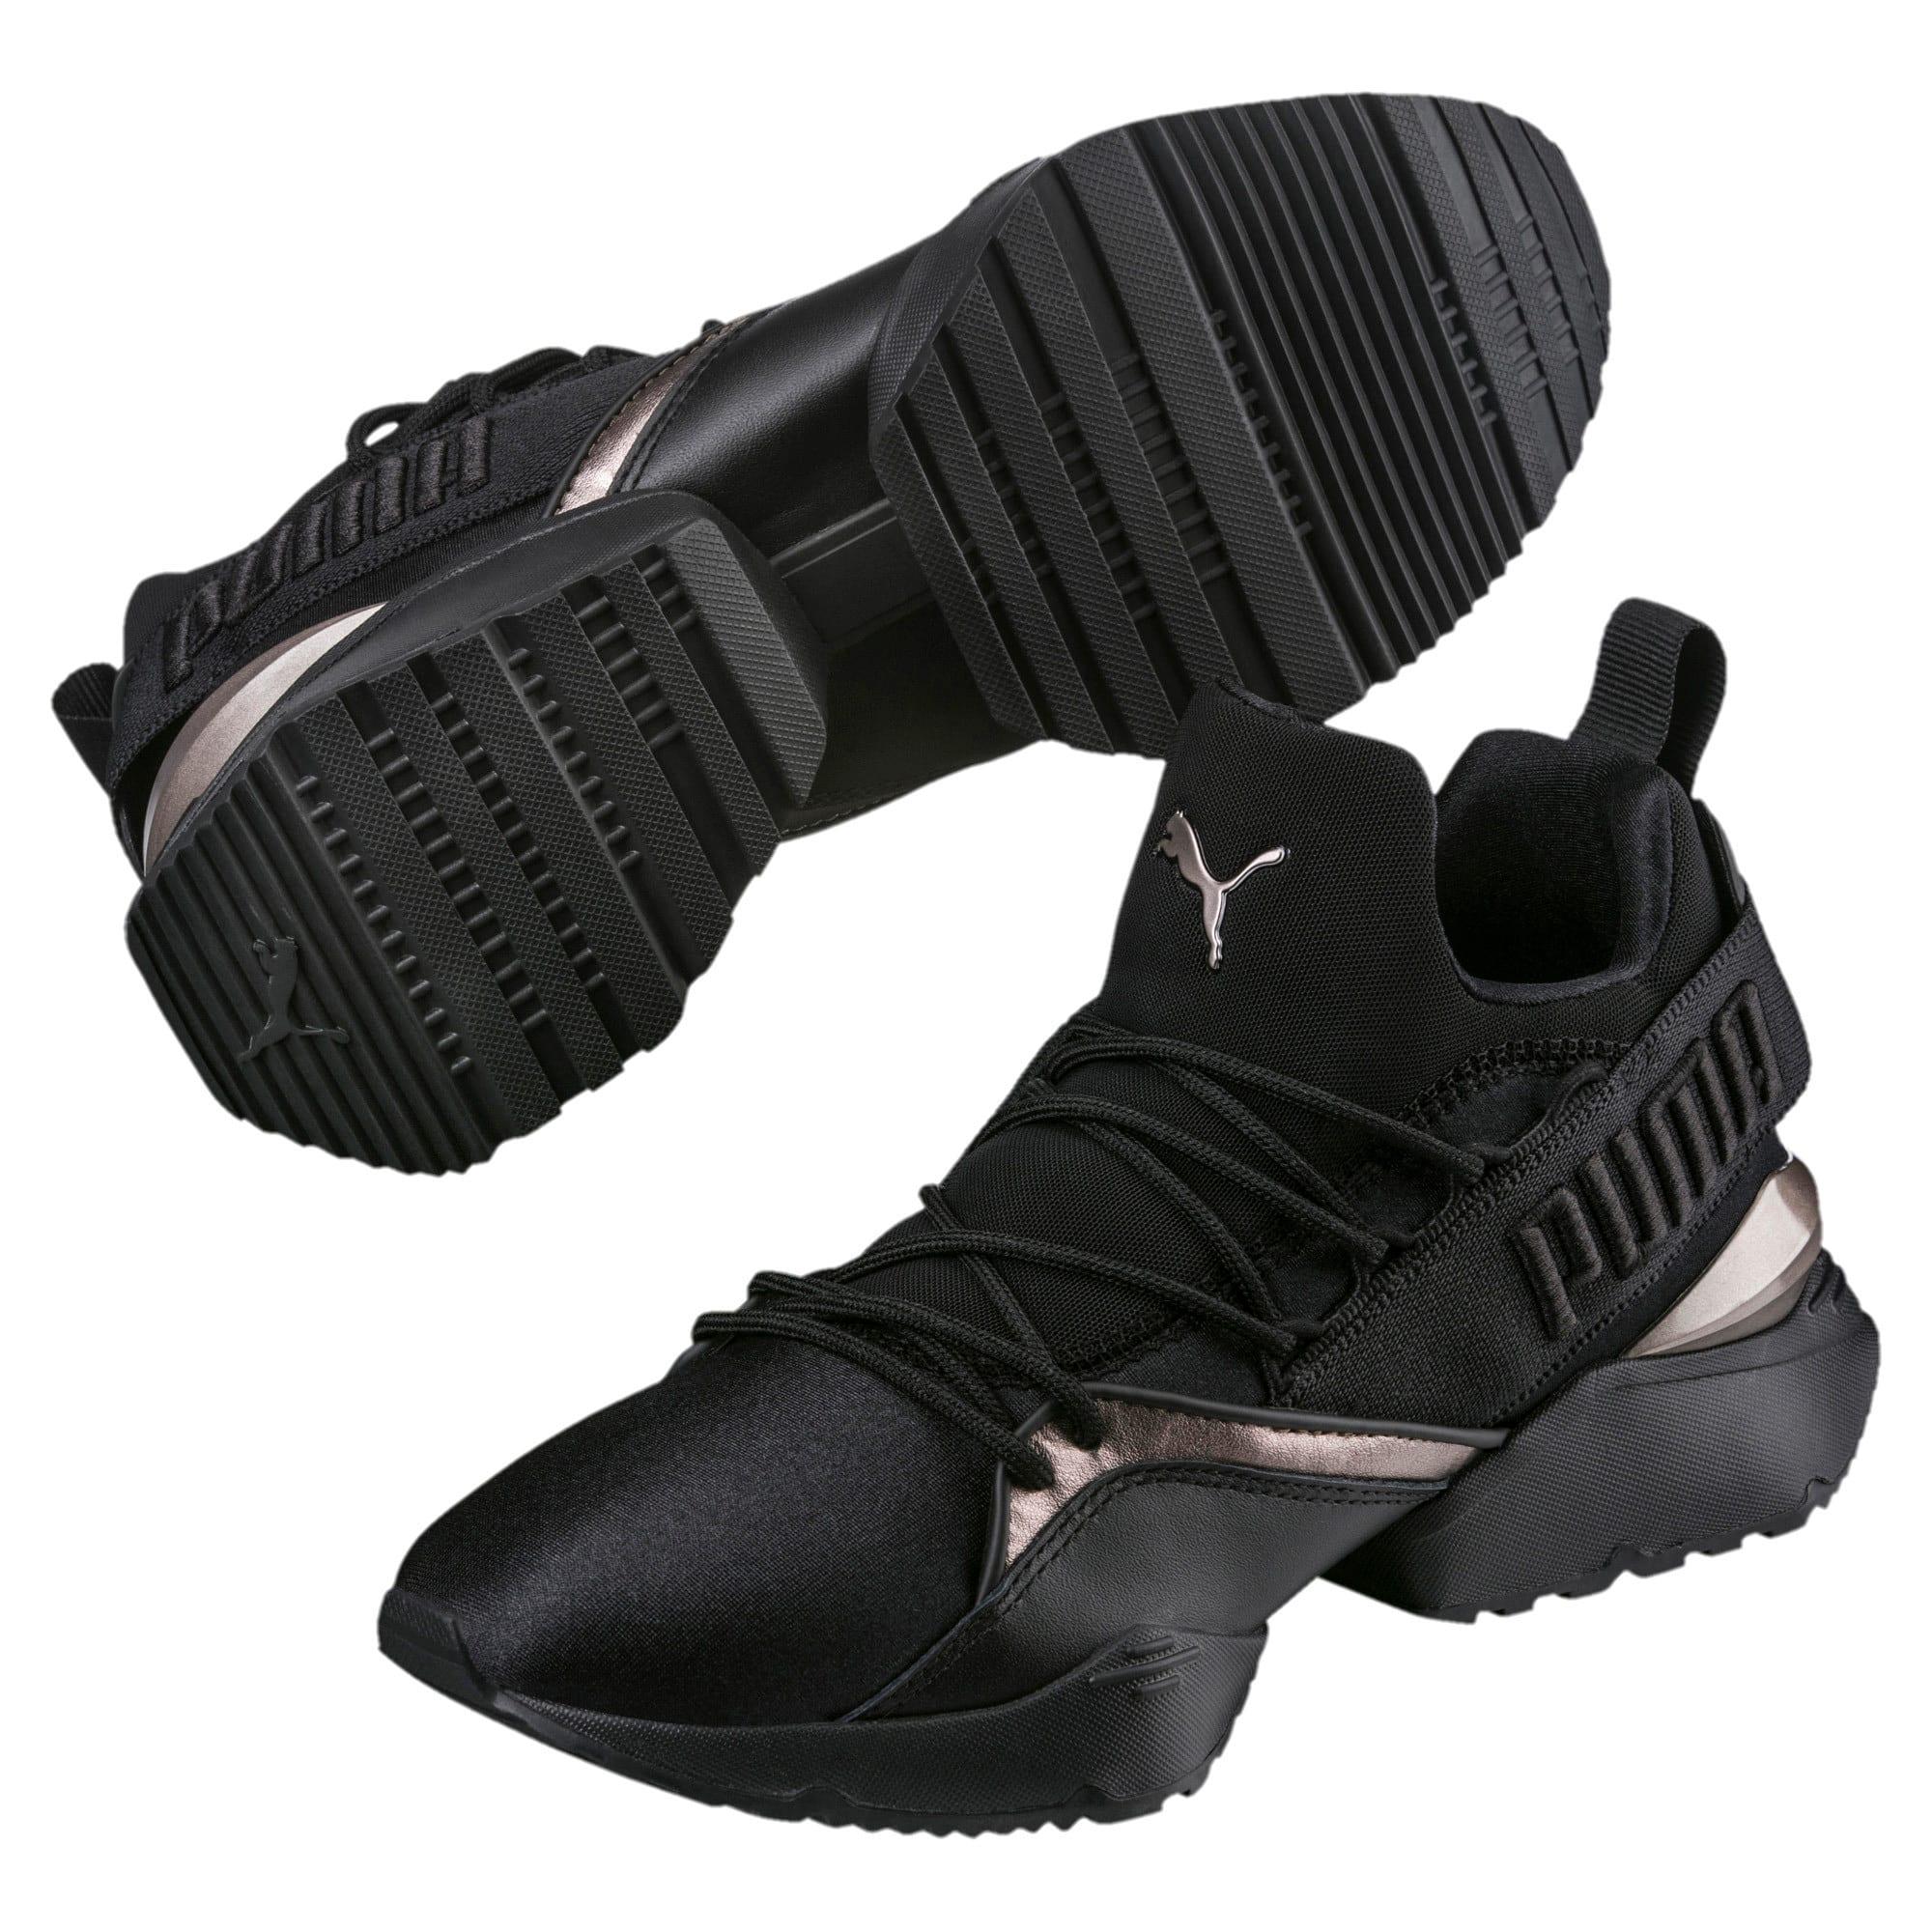 Thumbnail 2 of Muse Maia Luxe Women's Sneakers, Puma Black-Puma Black, medium